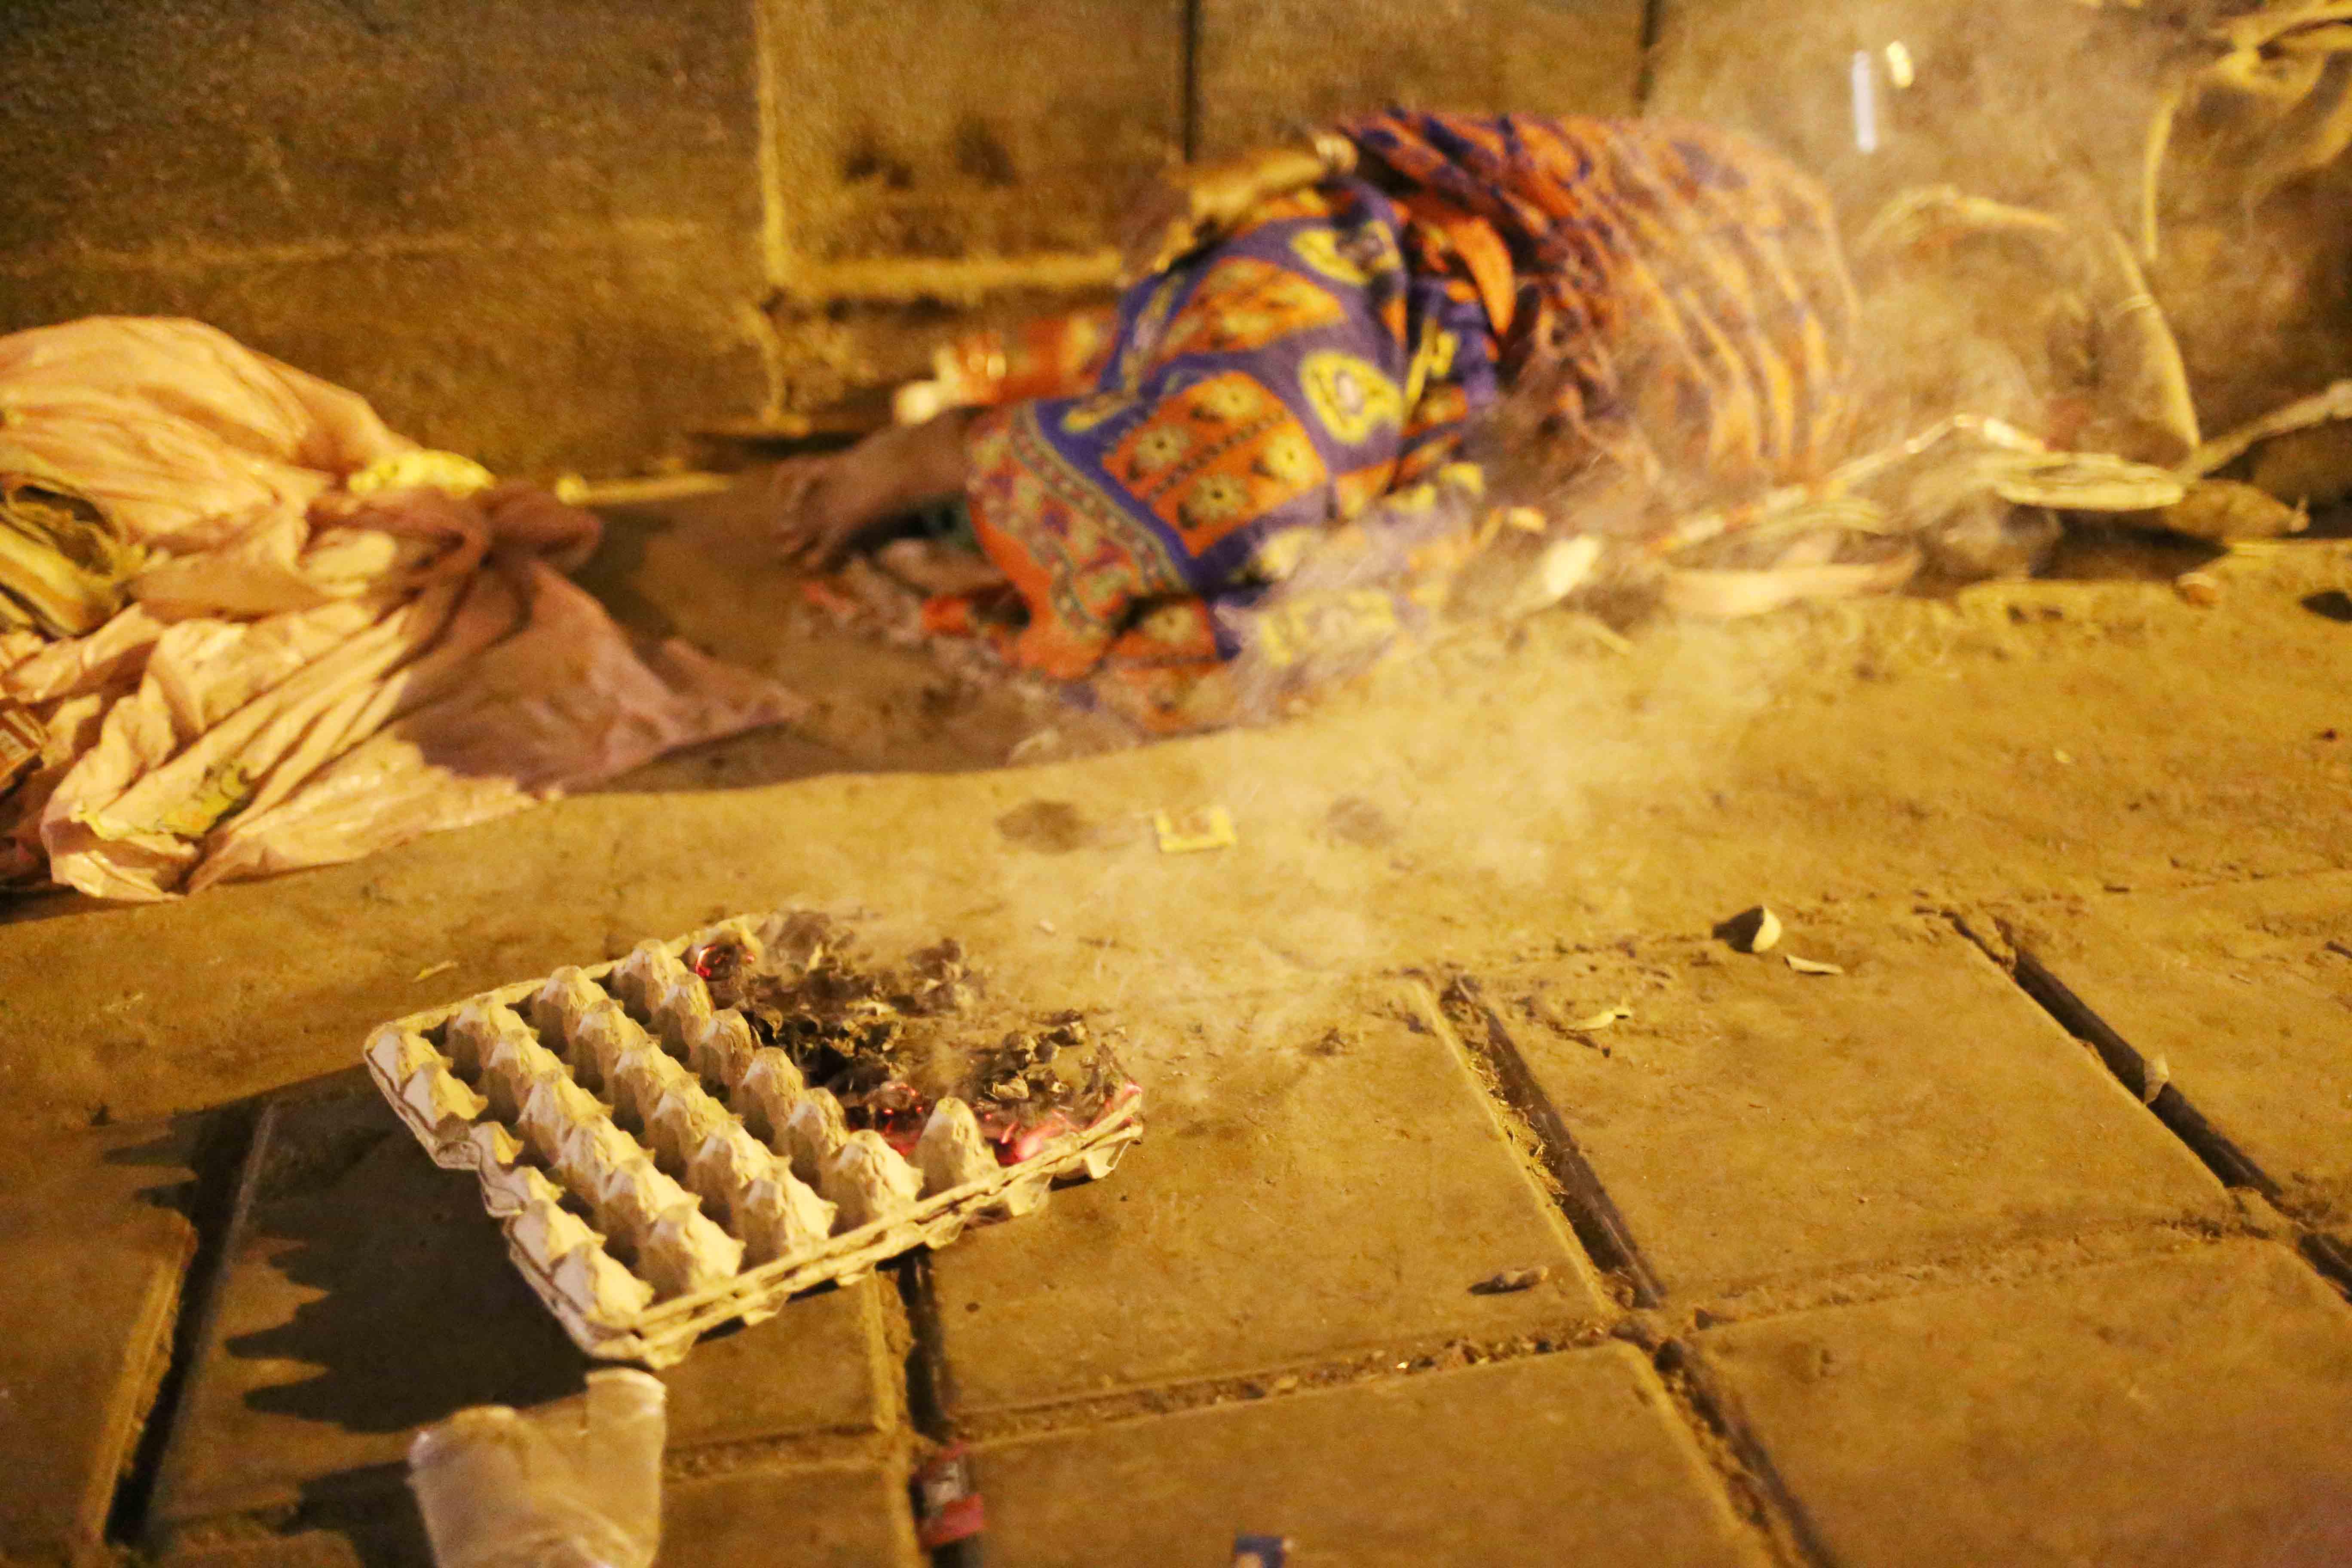 City Life - The Mystery of the Burning Egg Crates, Hazrat Nizamuddin Basti